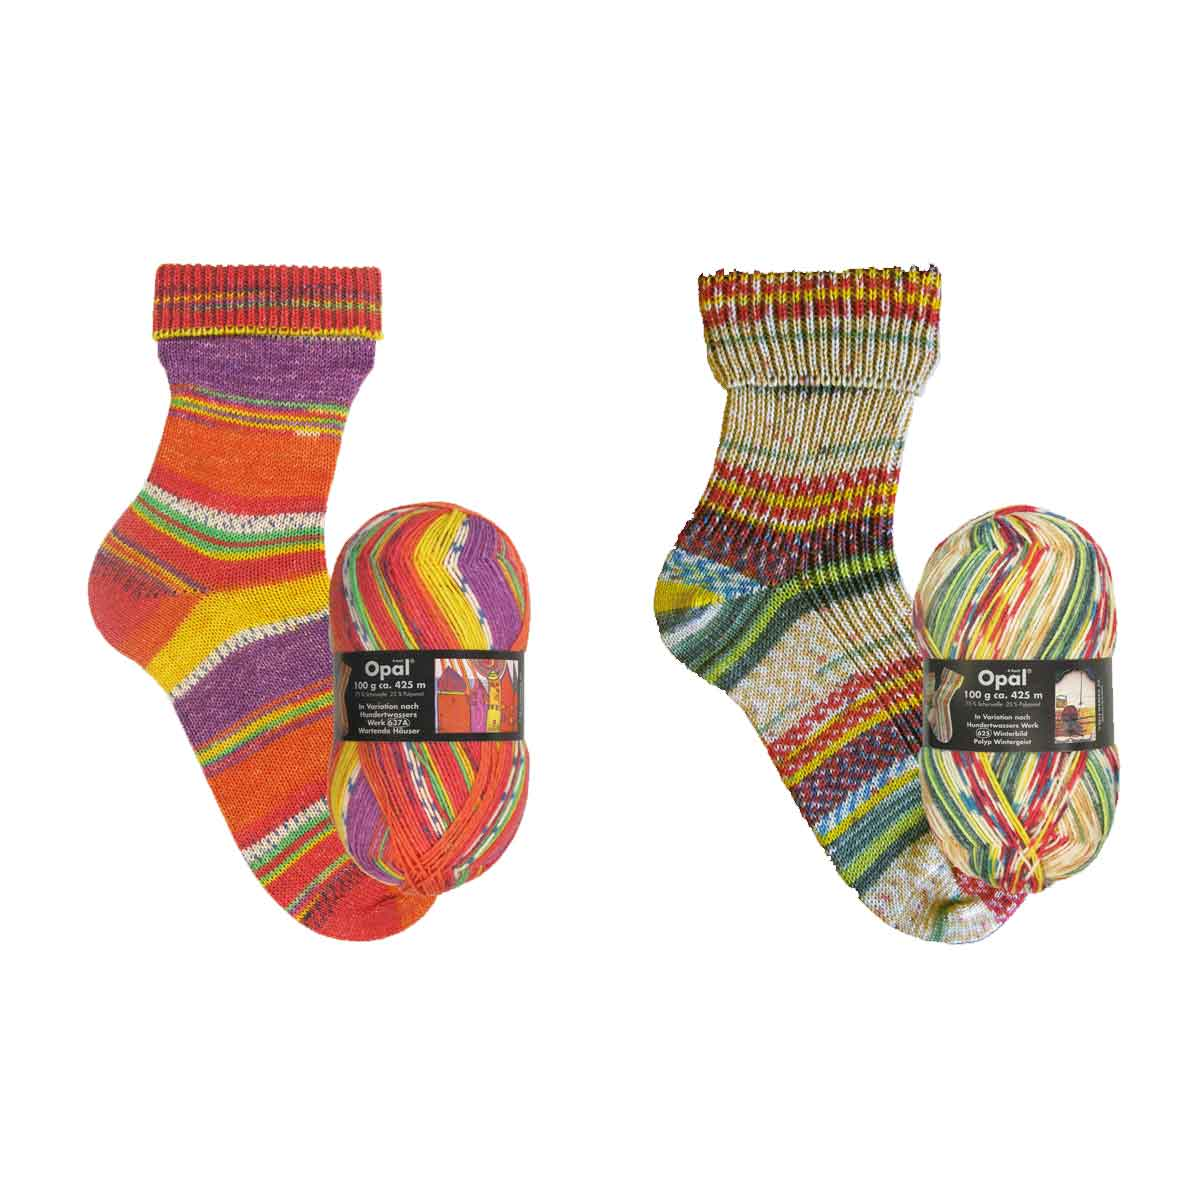 opal hundertwasser sokkenwol